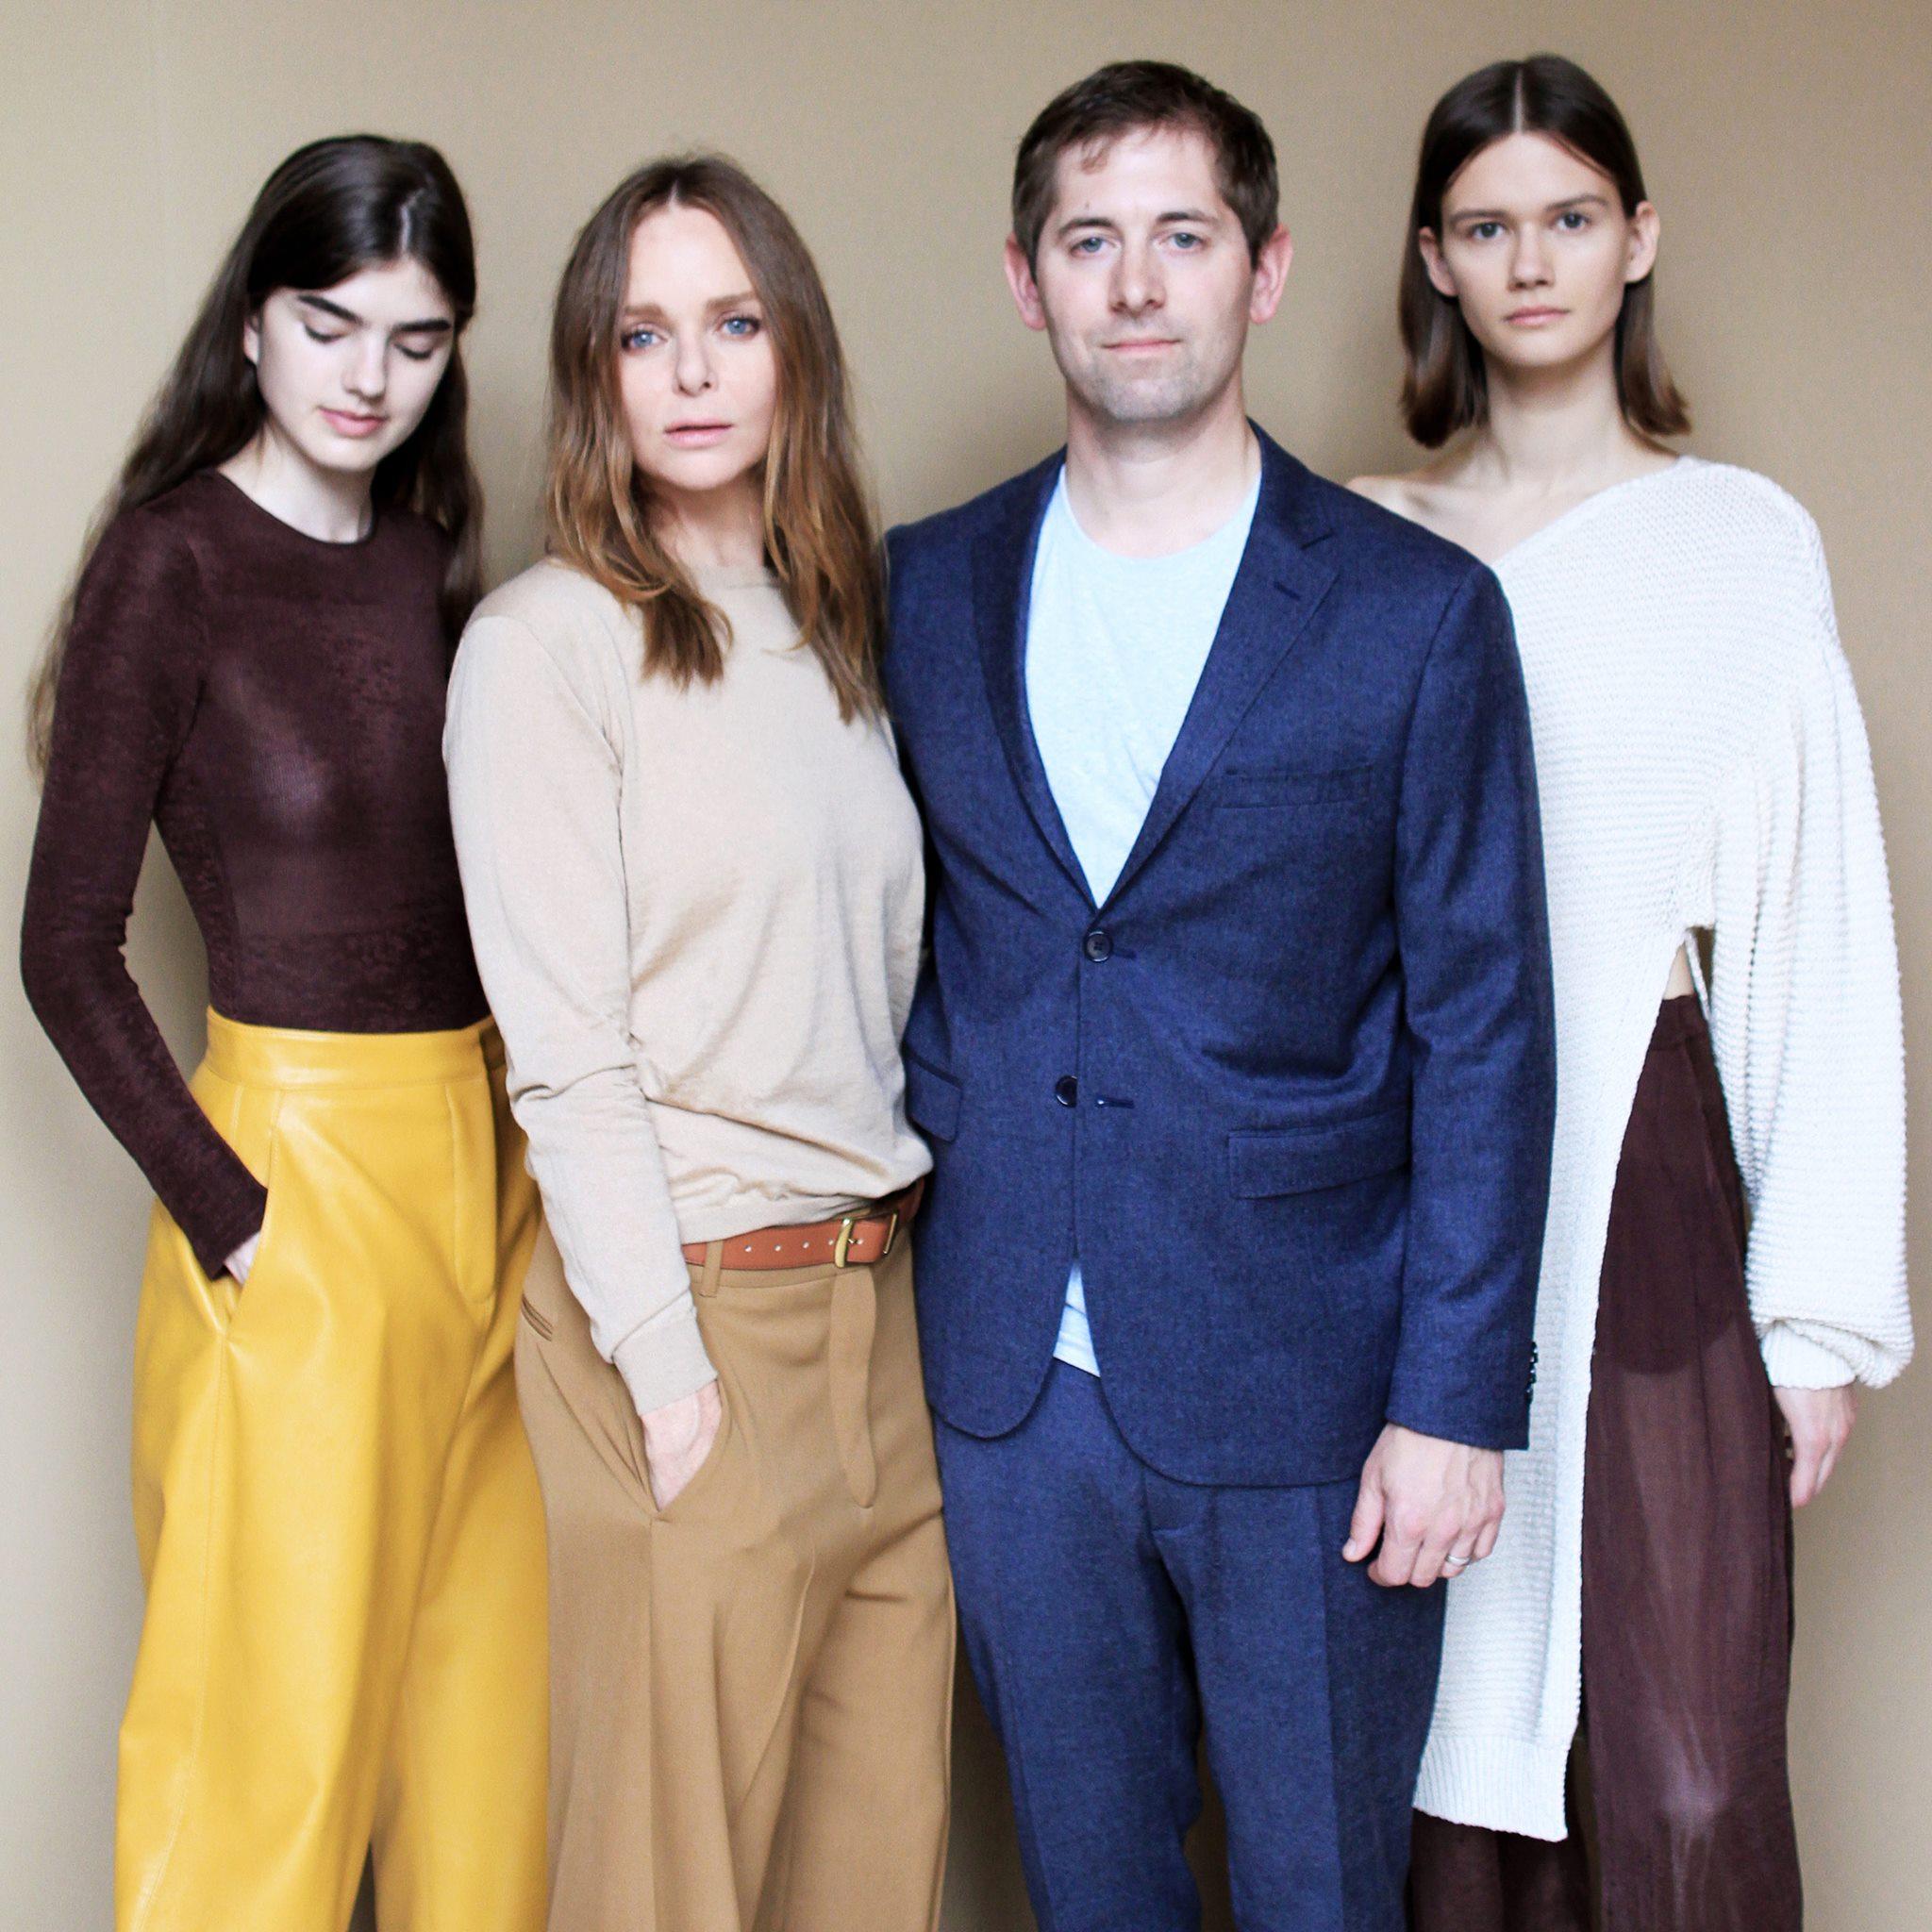 Dan Widmaier with Stella McCartney & models at Fashion Week, Paris, October 2017